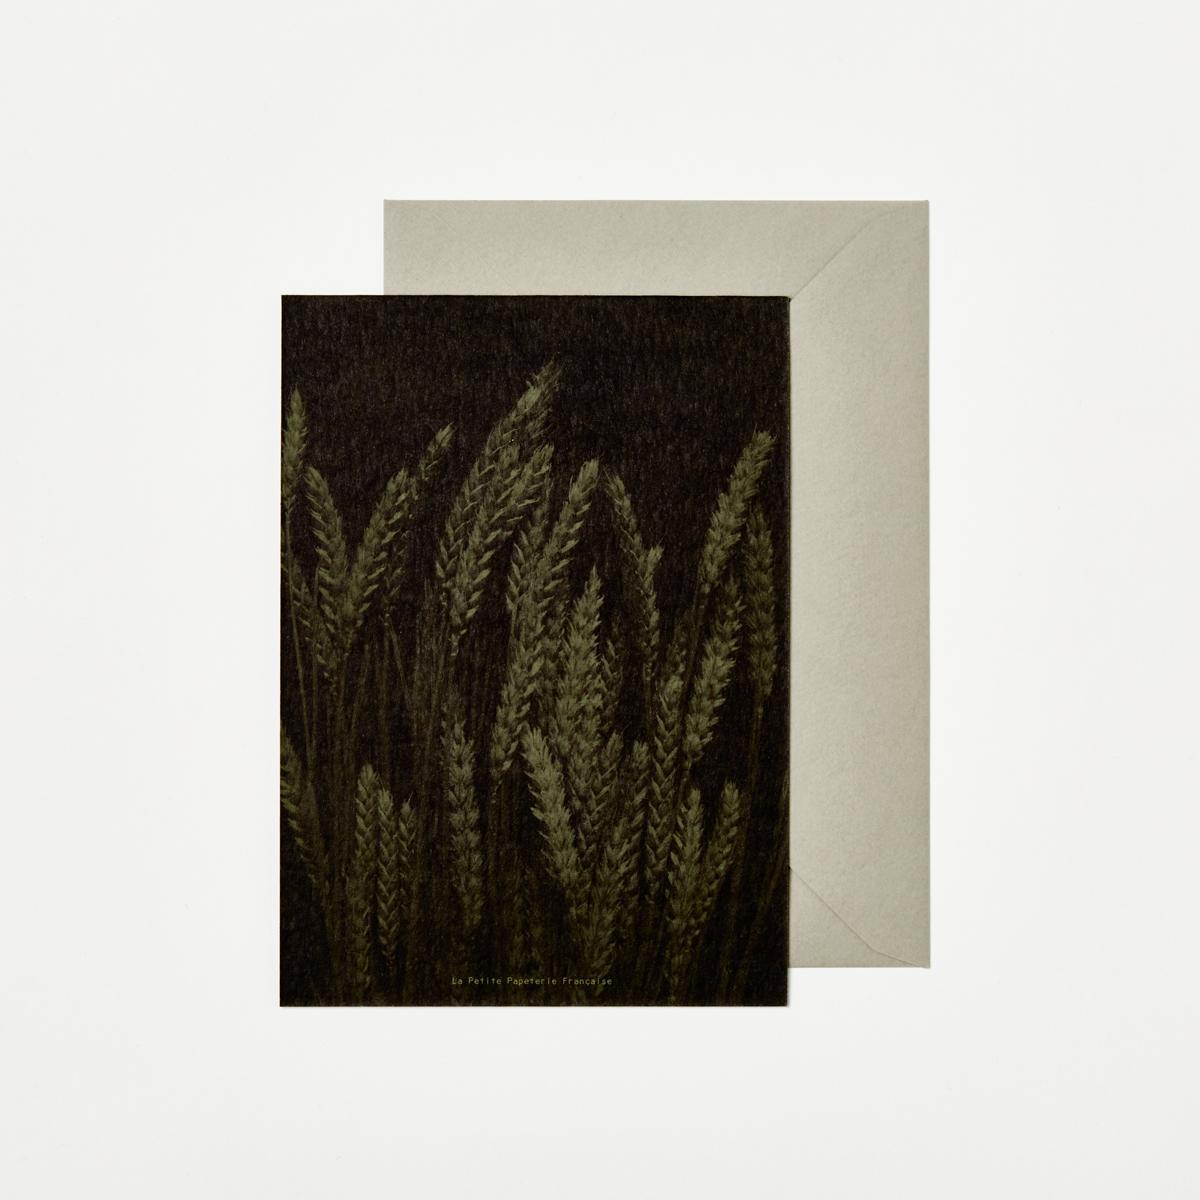 La Petite Papeterie Française Wheat Greeting Card